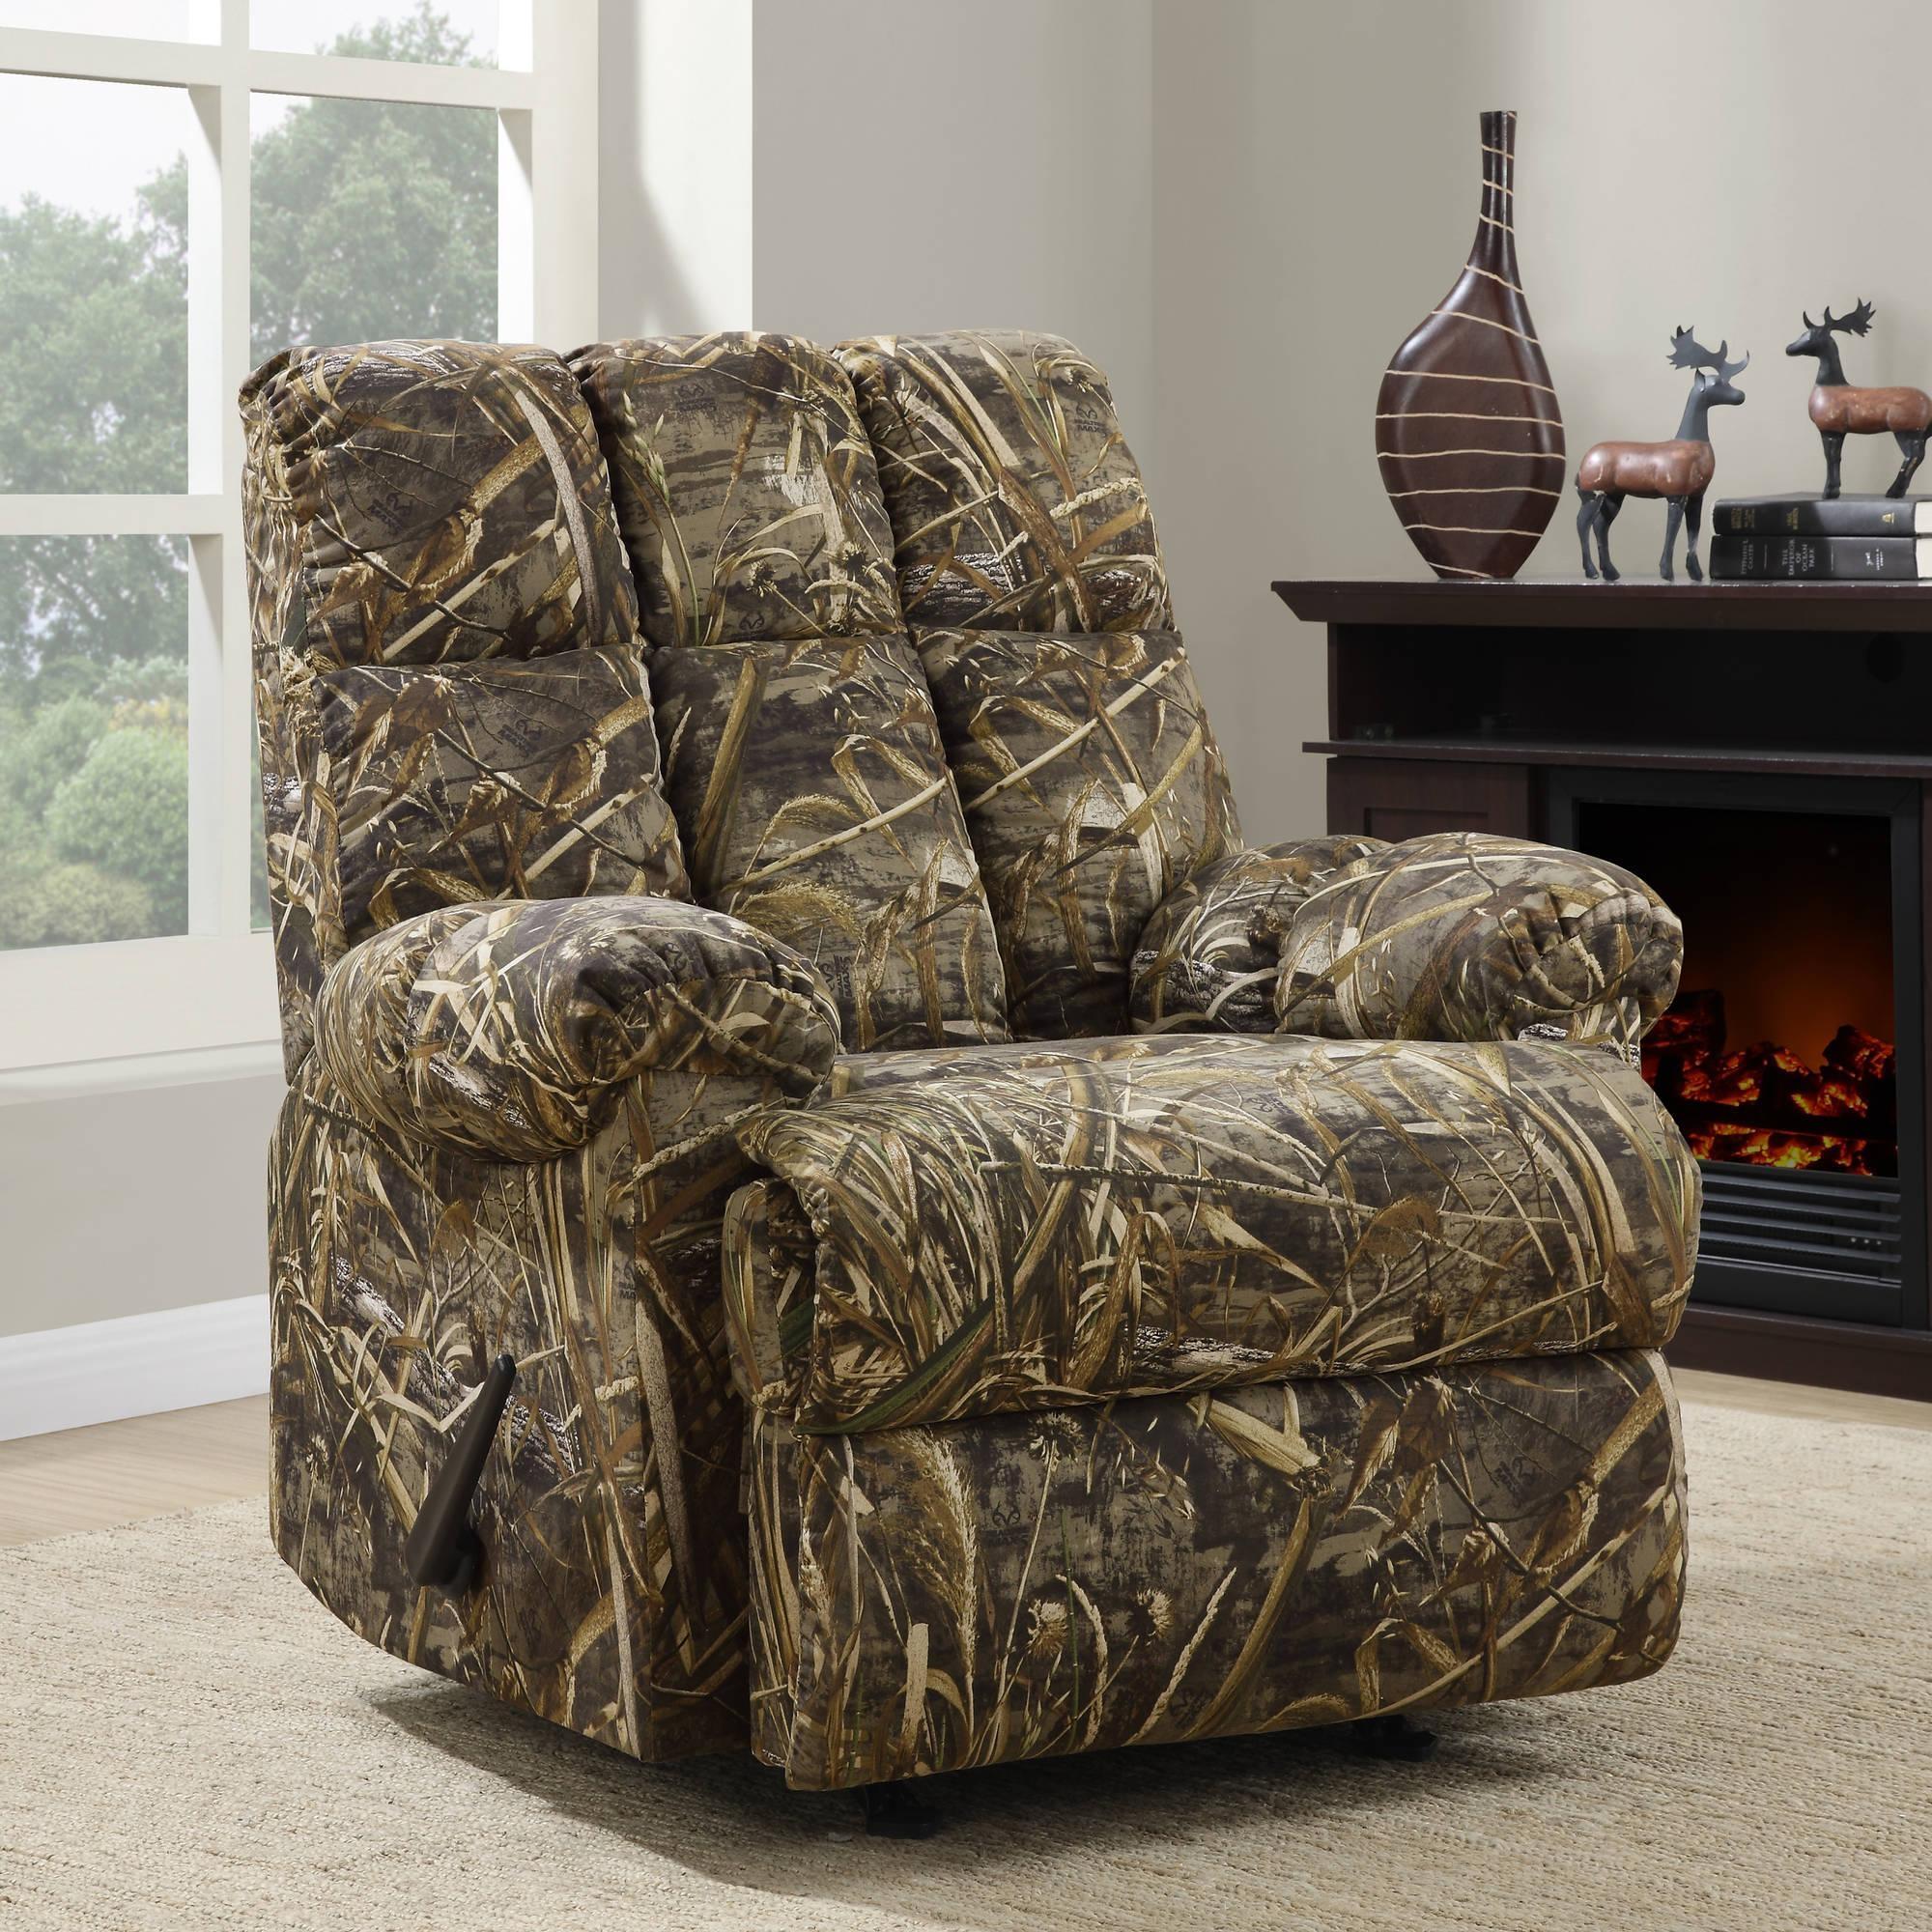 Dorel Home Realtree Camouflage Rocker Recliner – Walmart Inside Camouflage Sofas (Image 7 of 20)